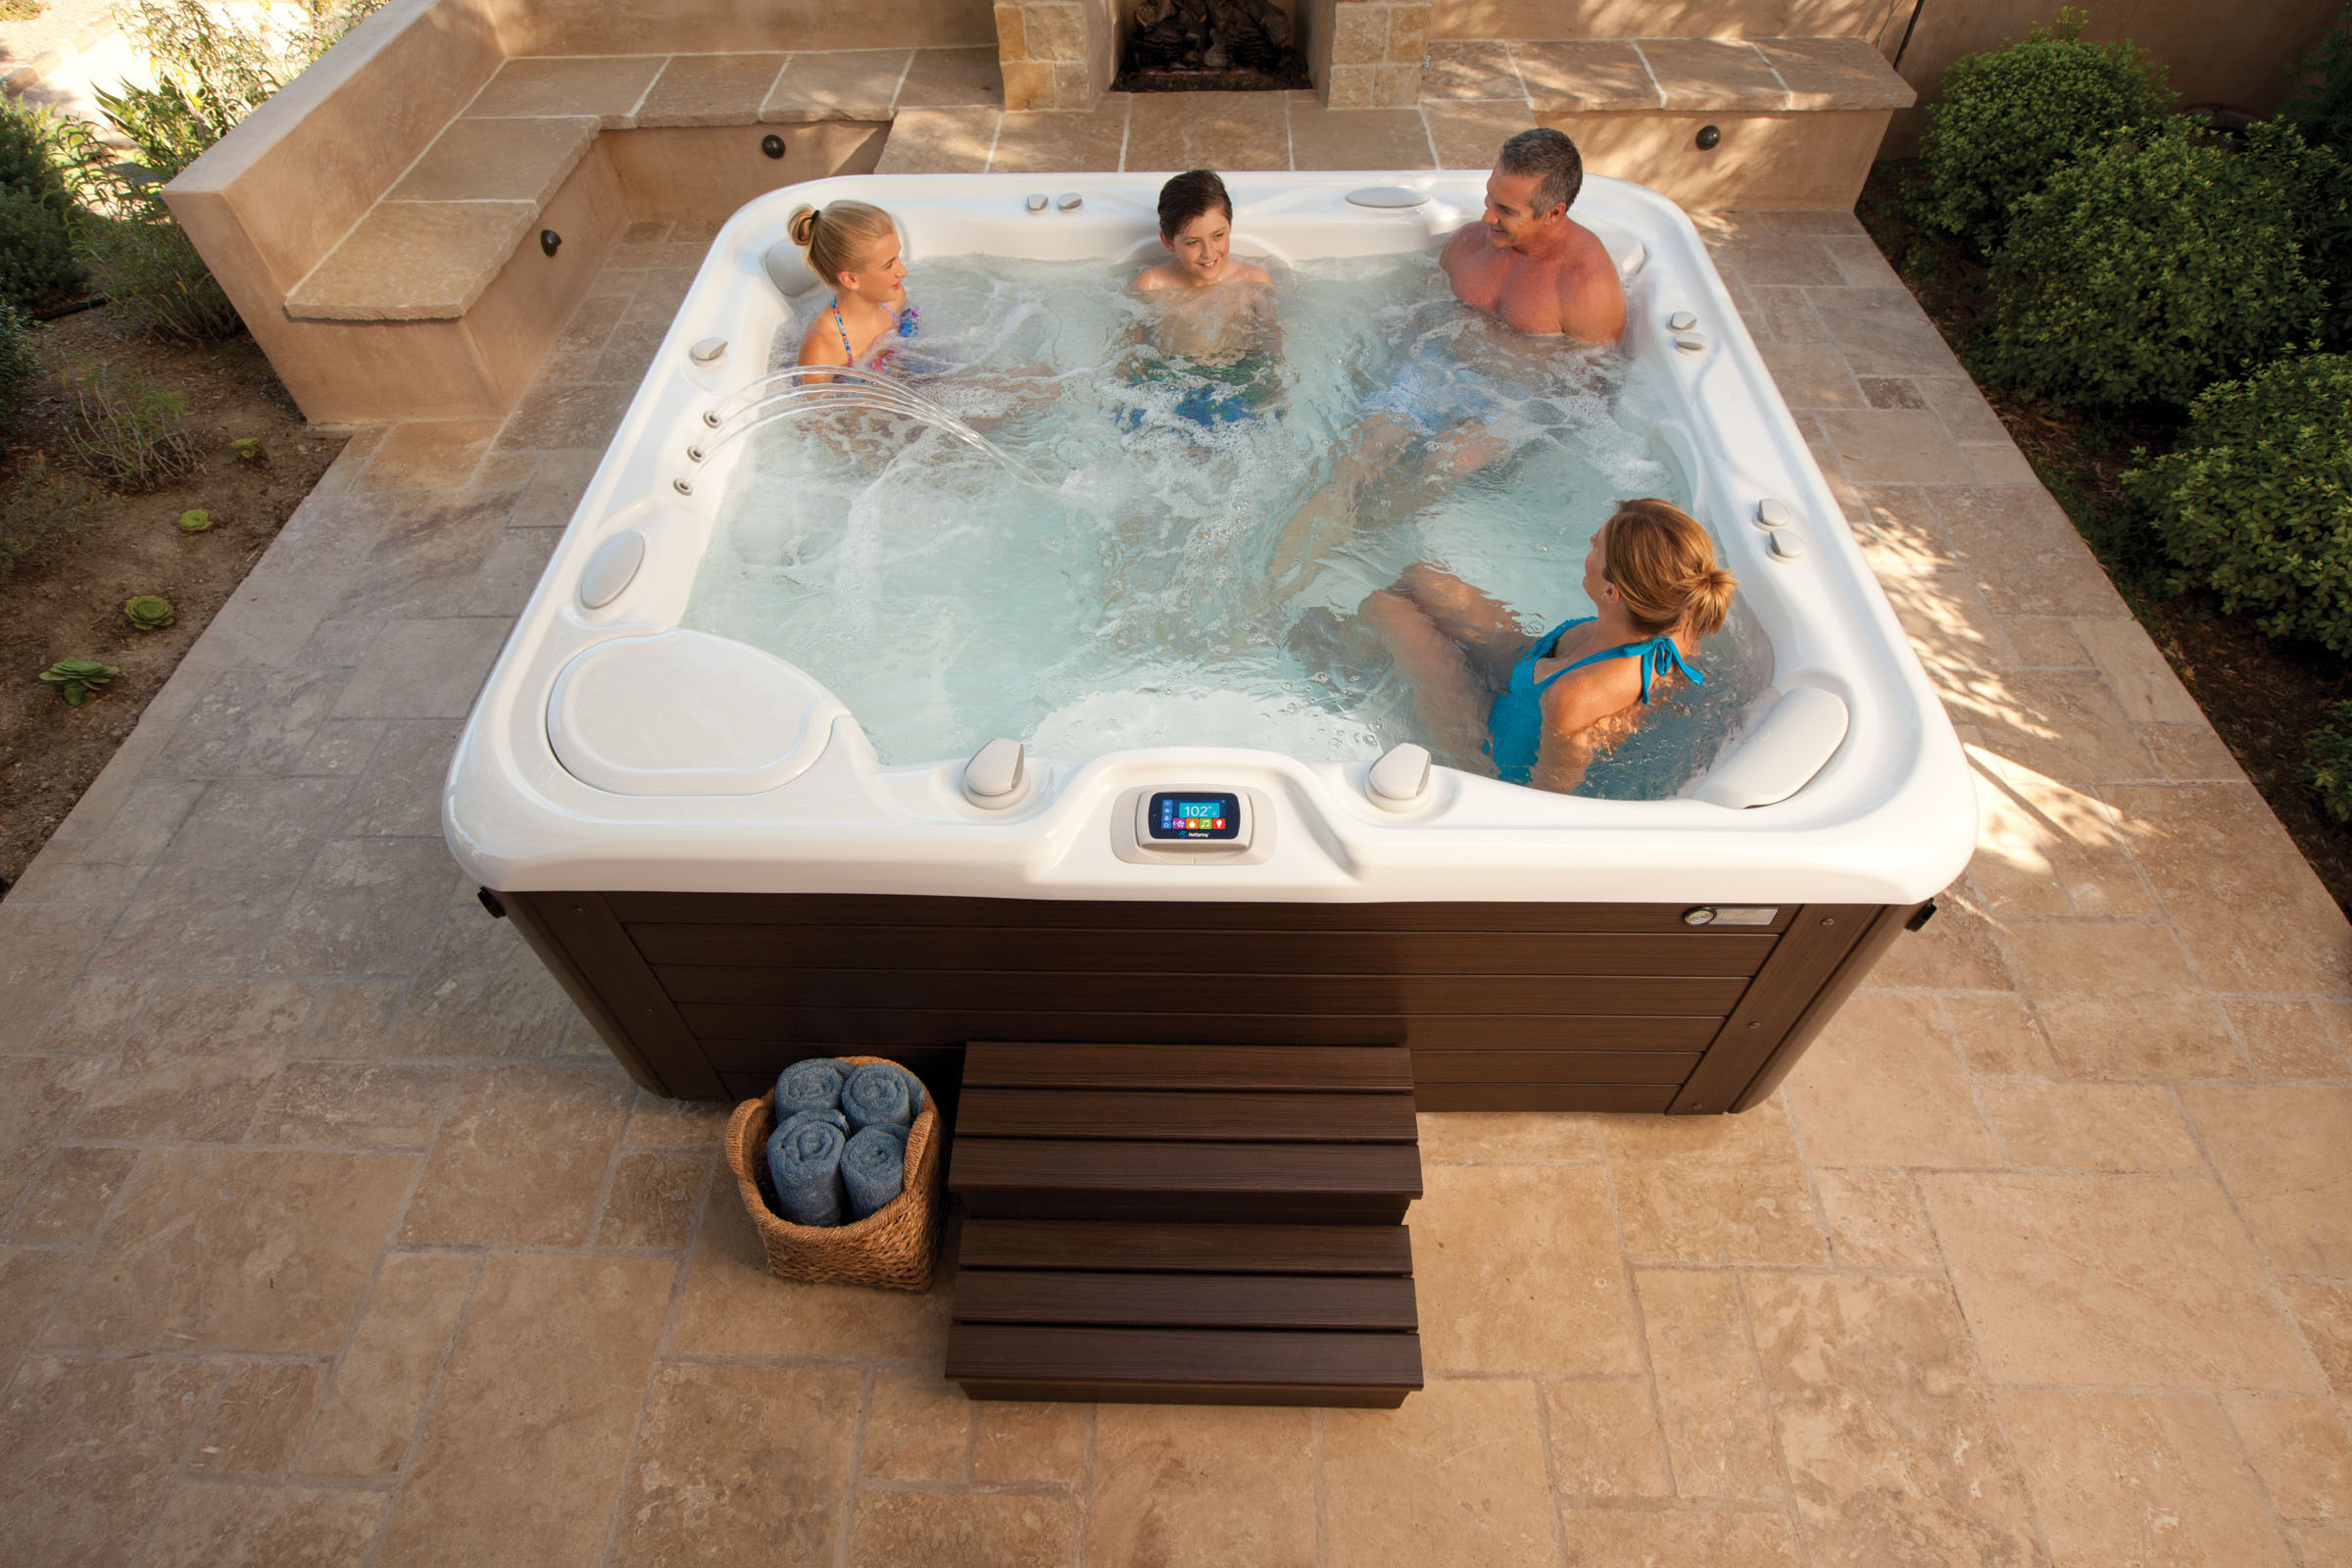 ace financing event tub spas hotspring sale spring may hot water salt instagram